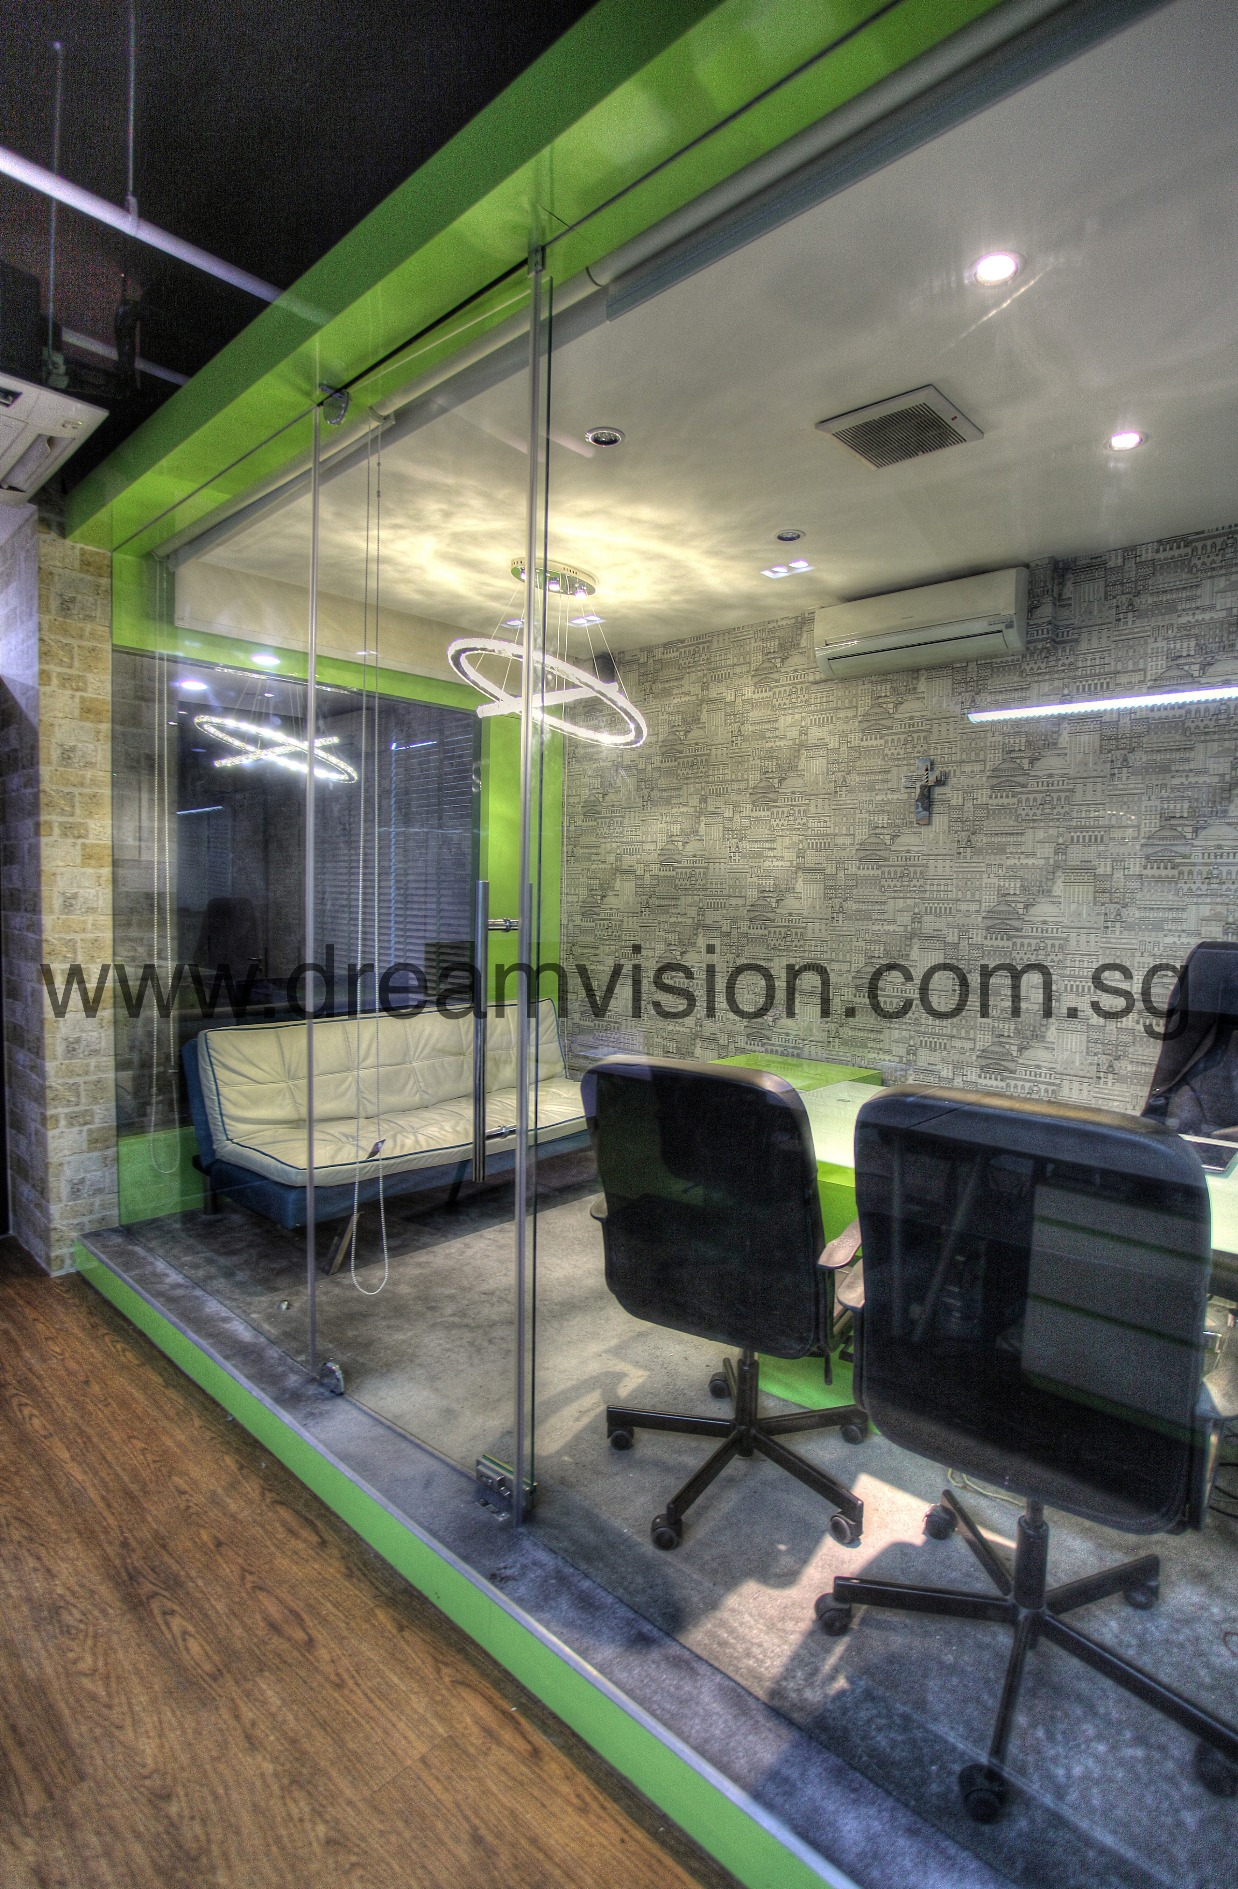 DREAM VISION OFFICE